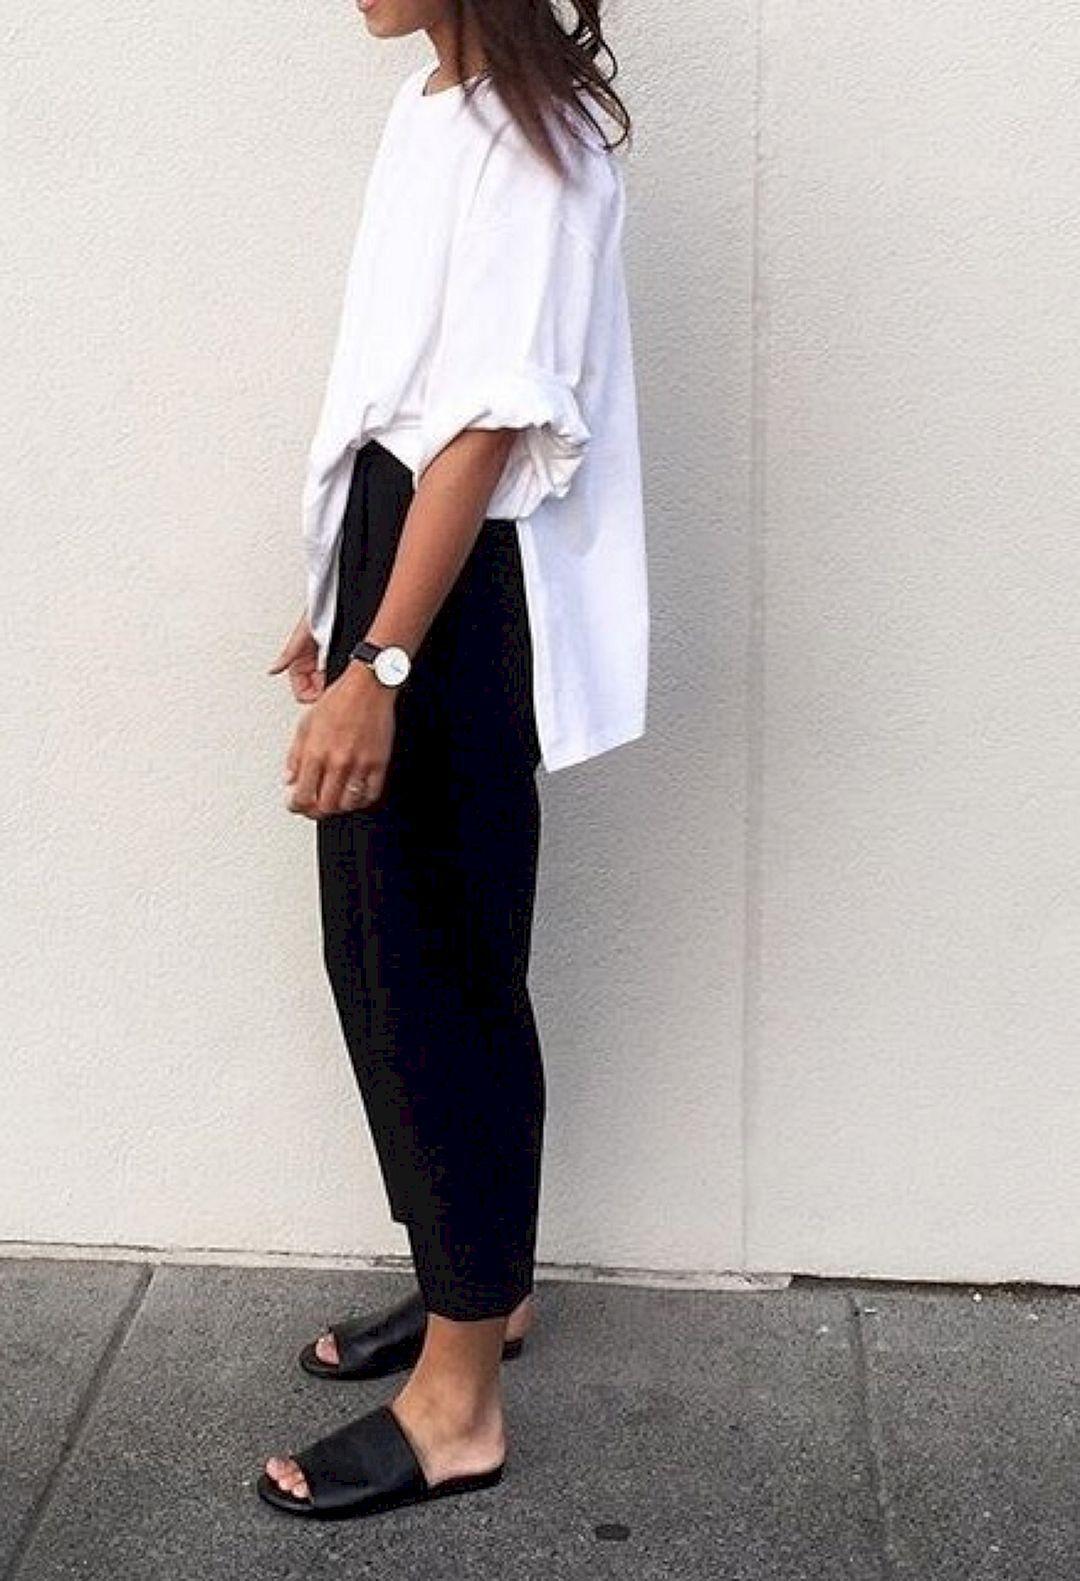 best womenus summer minimalist style outfits minimalist